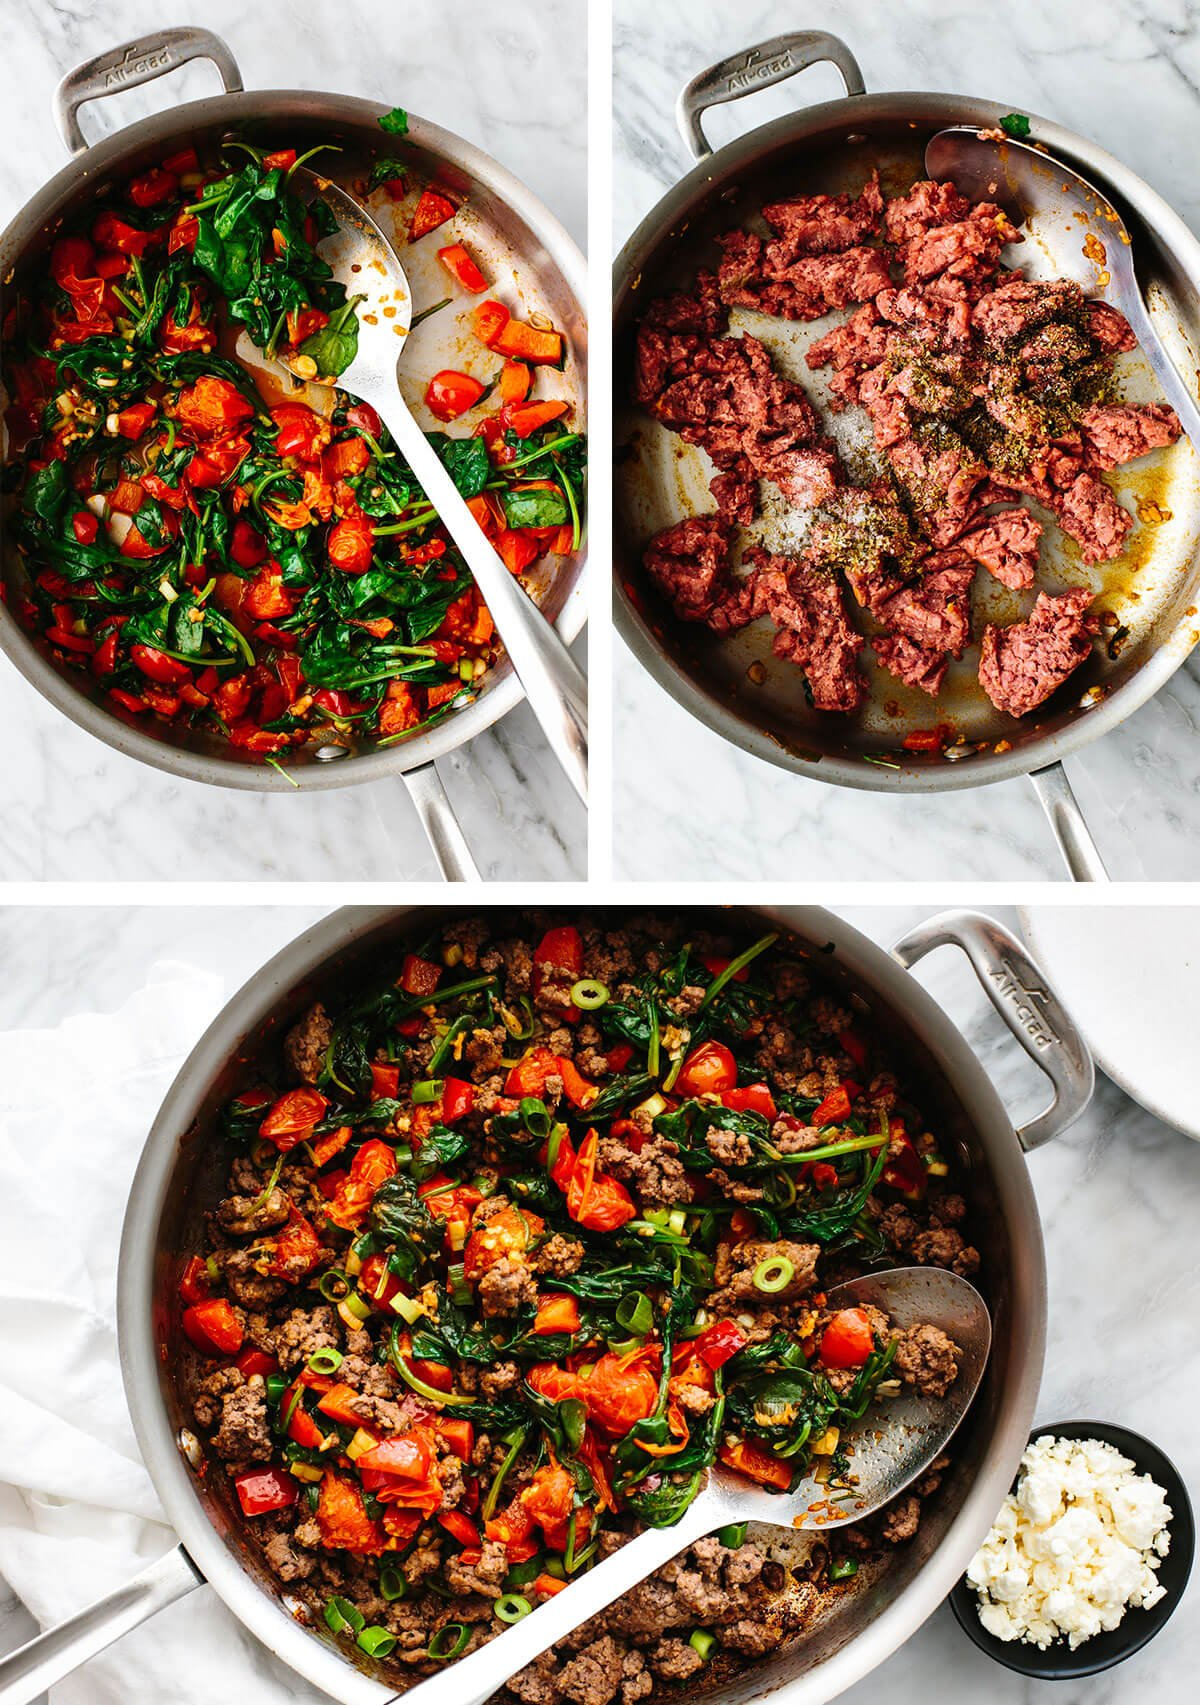 Cooking Mediterranean ground beef stir fry in a pan.